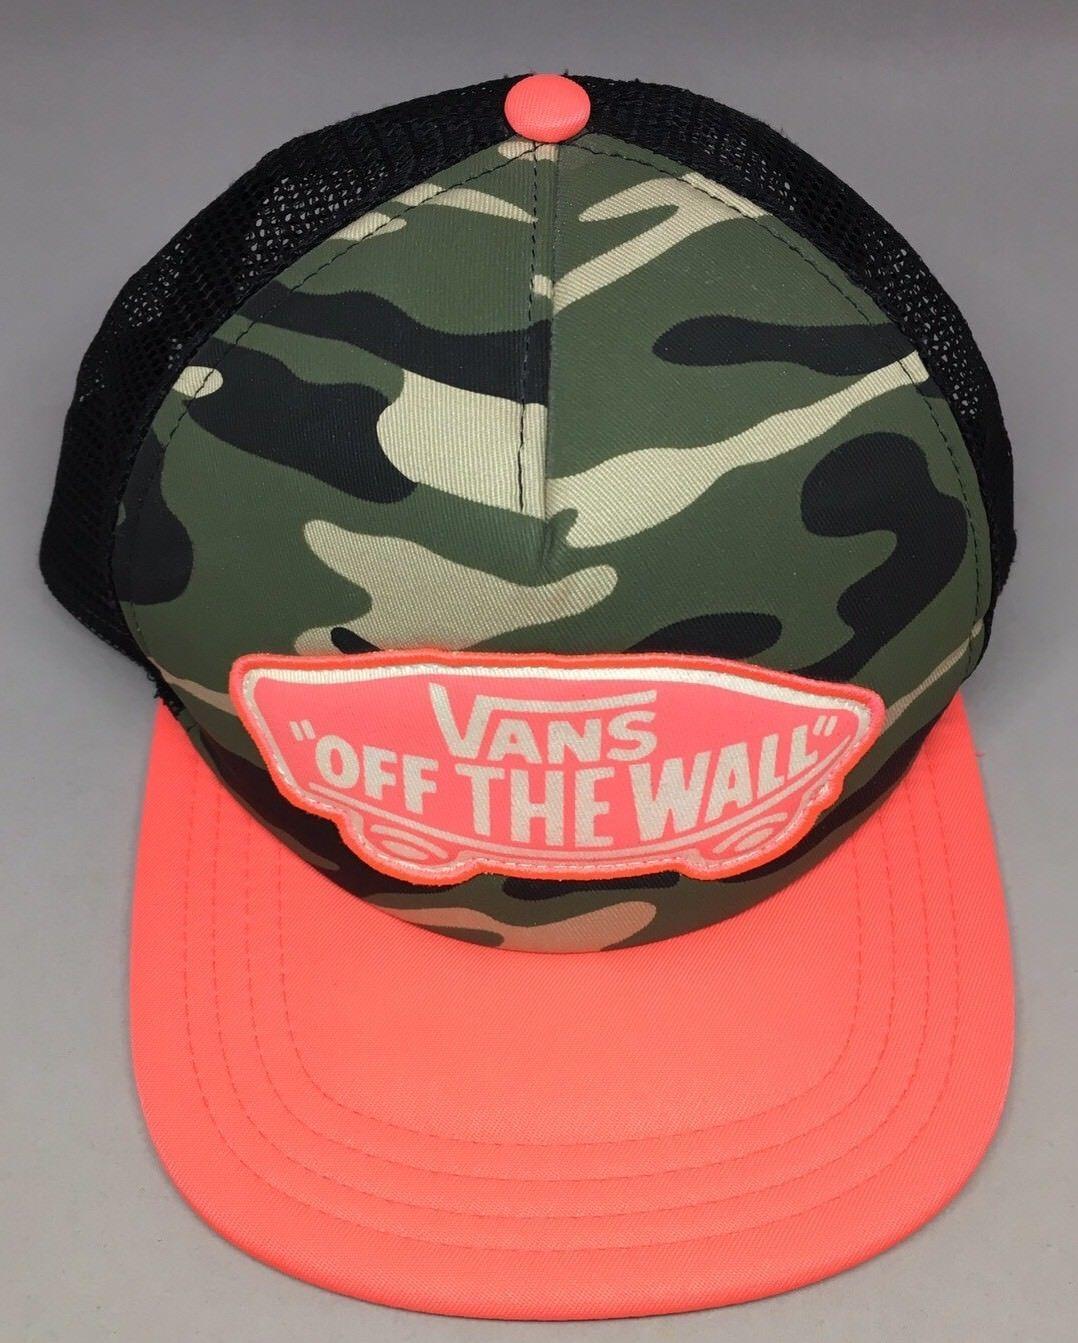 66d73d404818e Vans SnapBack Hat Off The Wall Camo HOT NEON Pink Mesh Trucker Cap  Camouflage